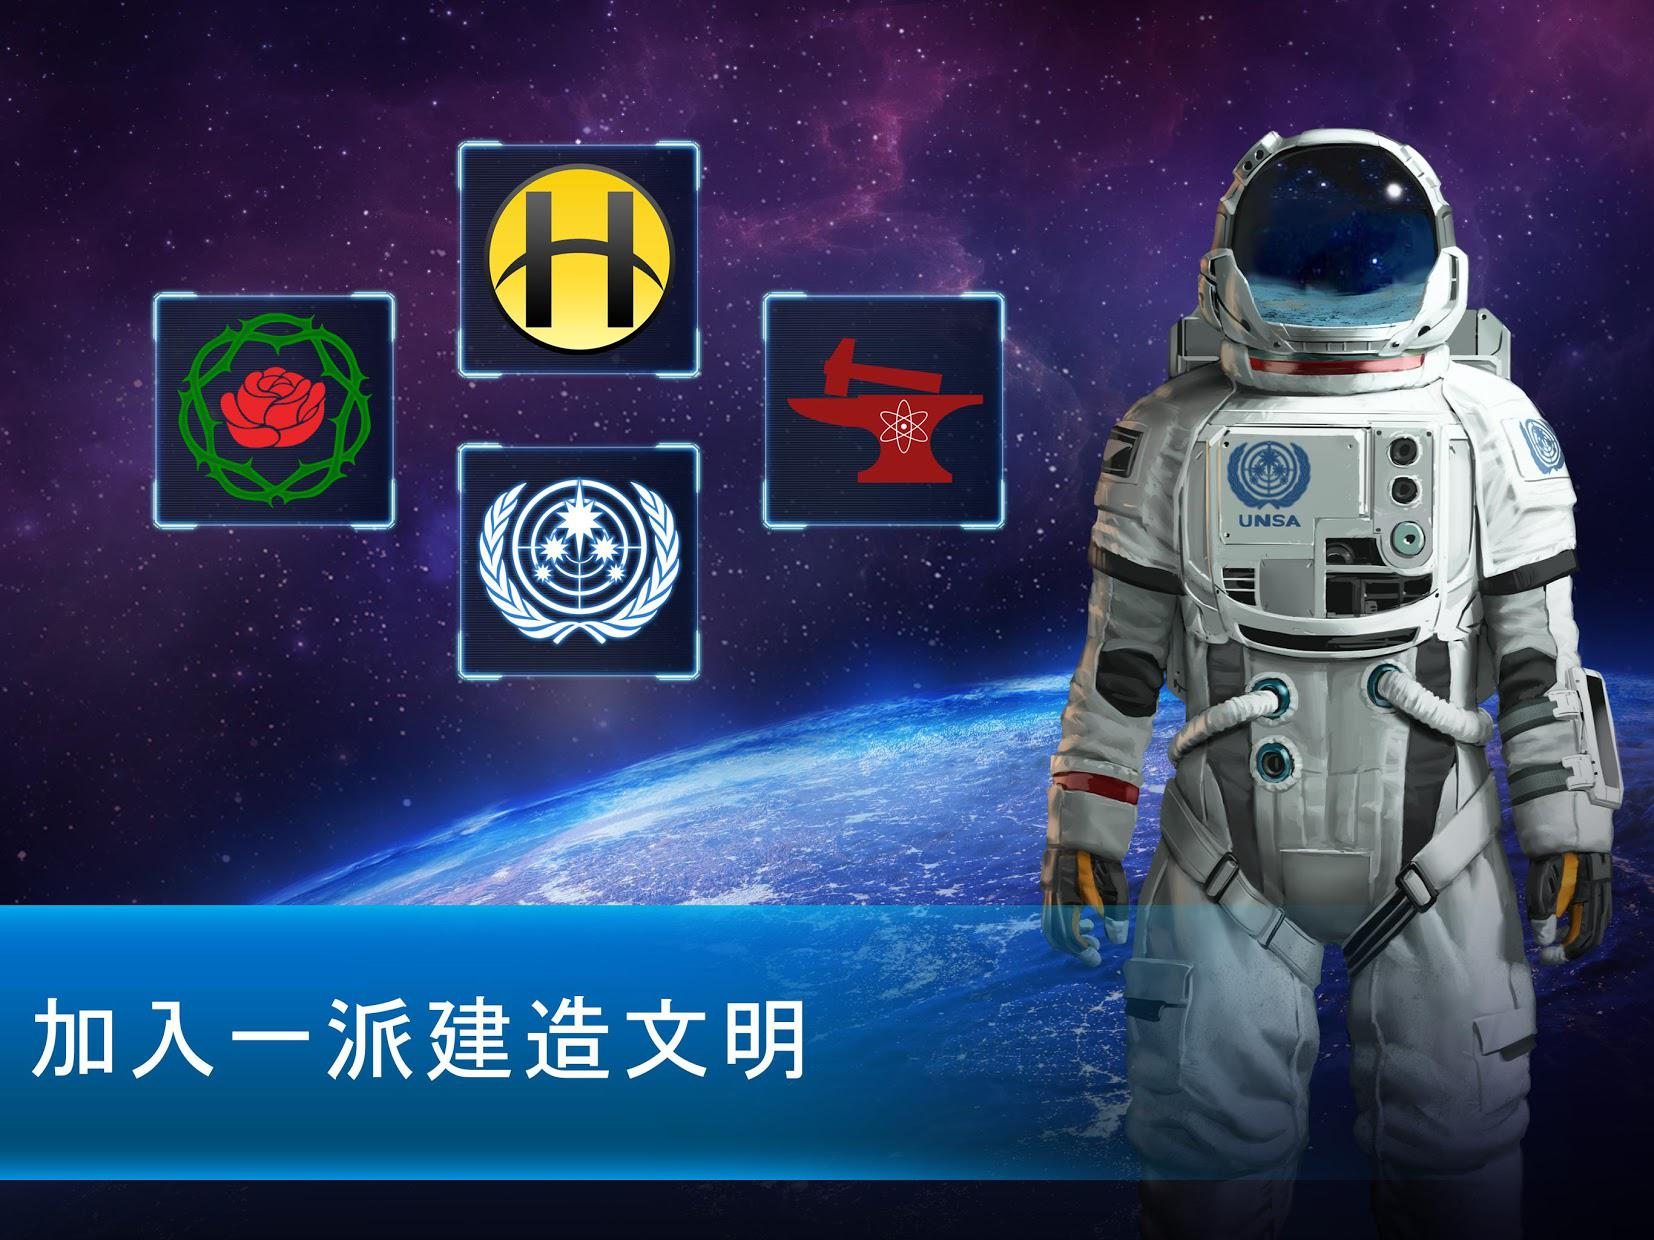 TerraGenesis - 太空驻扎者 游戏截图5